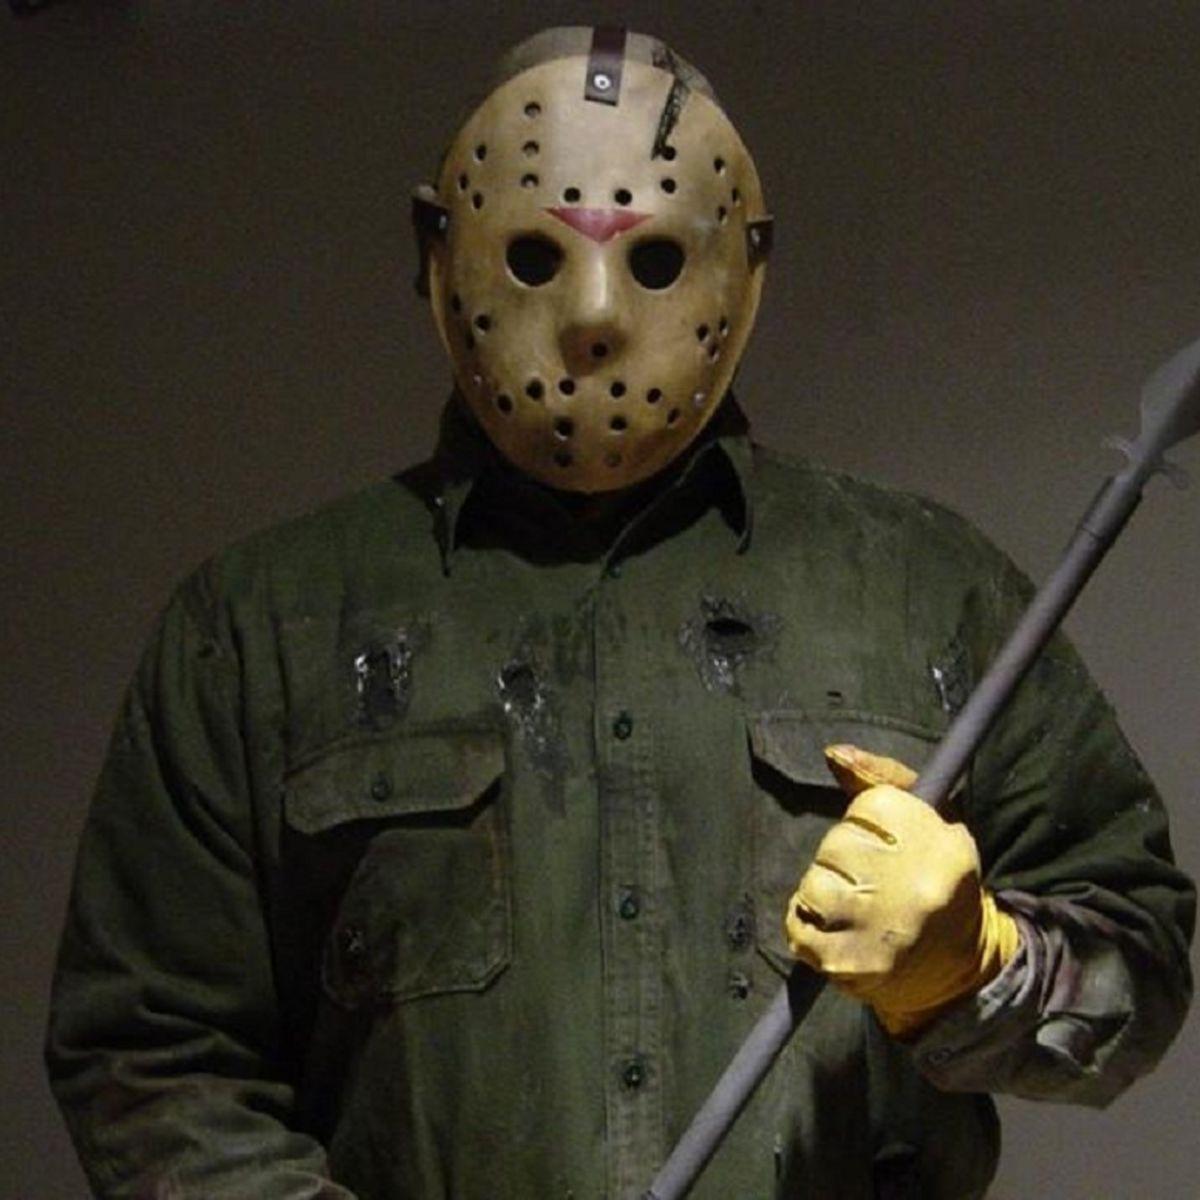 Jason-Voorhees-Friday-the-13th_0.jpg